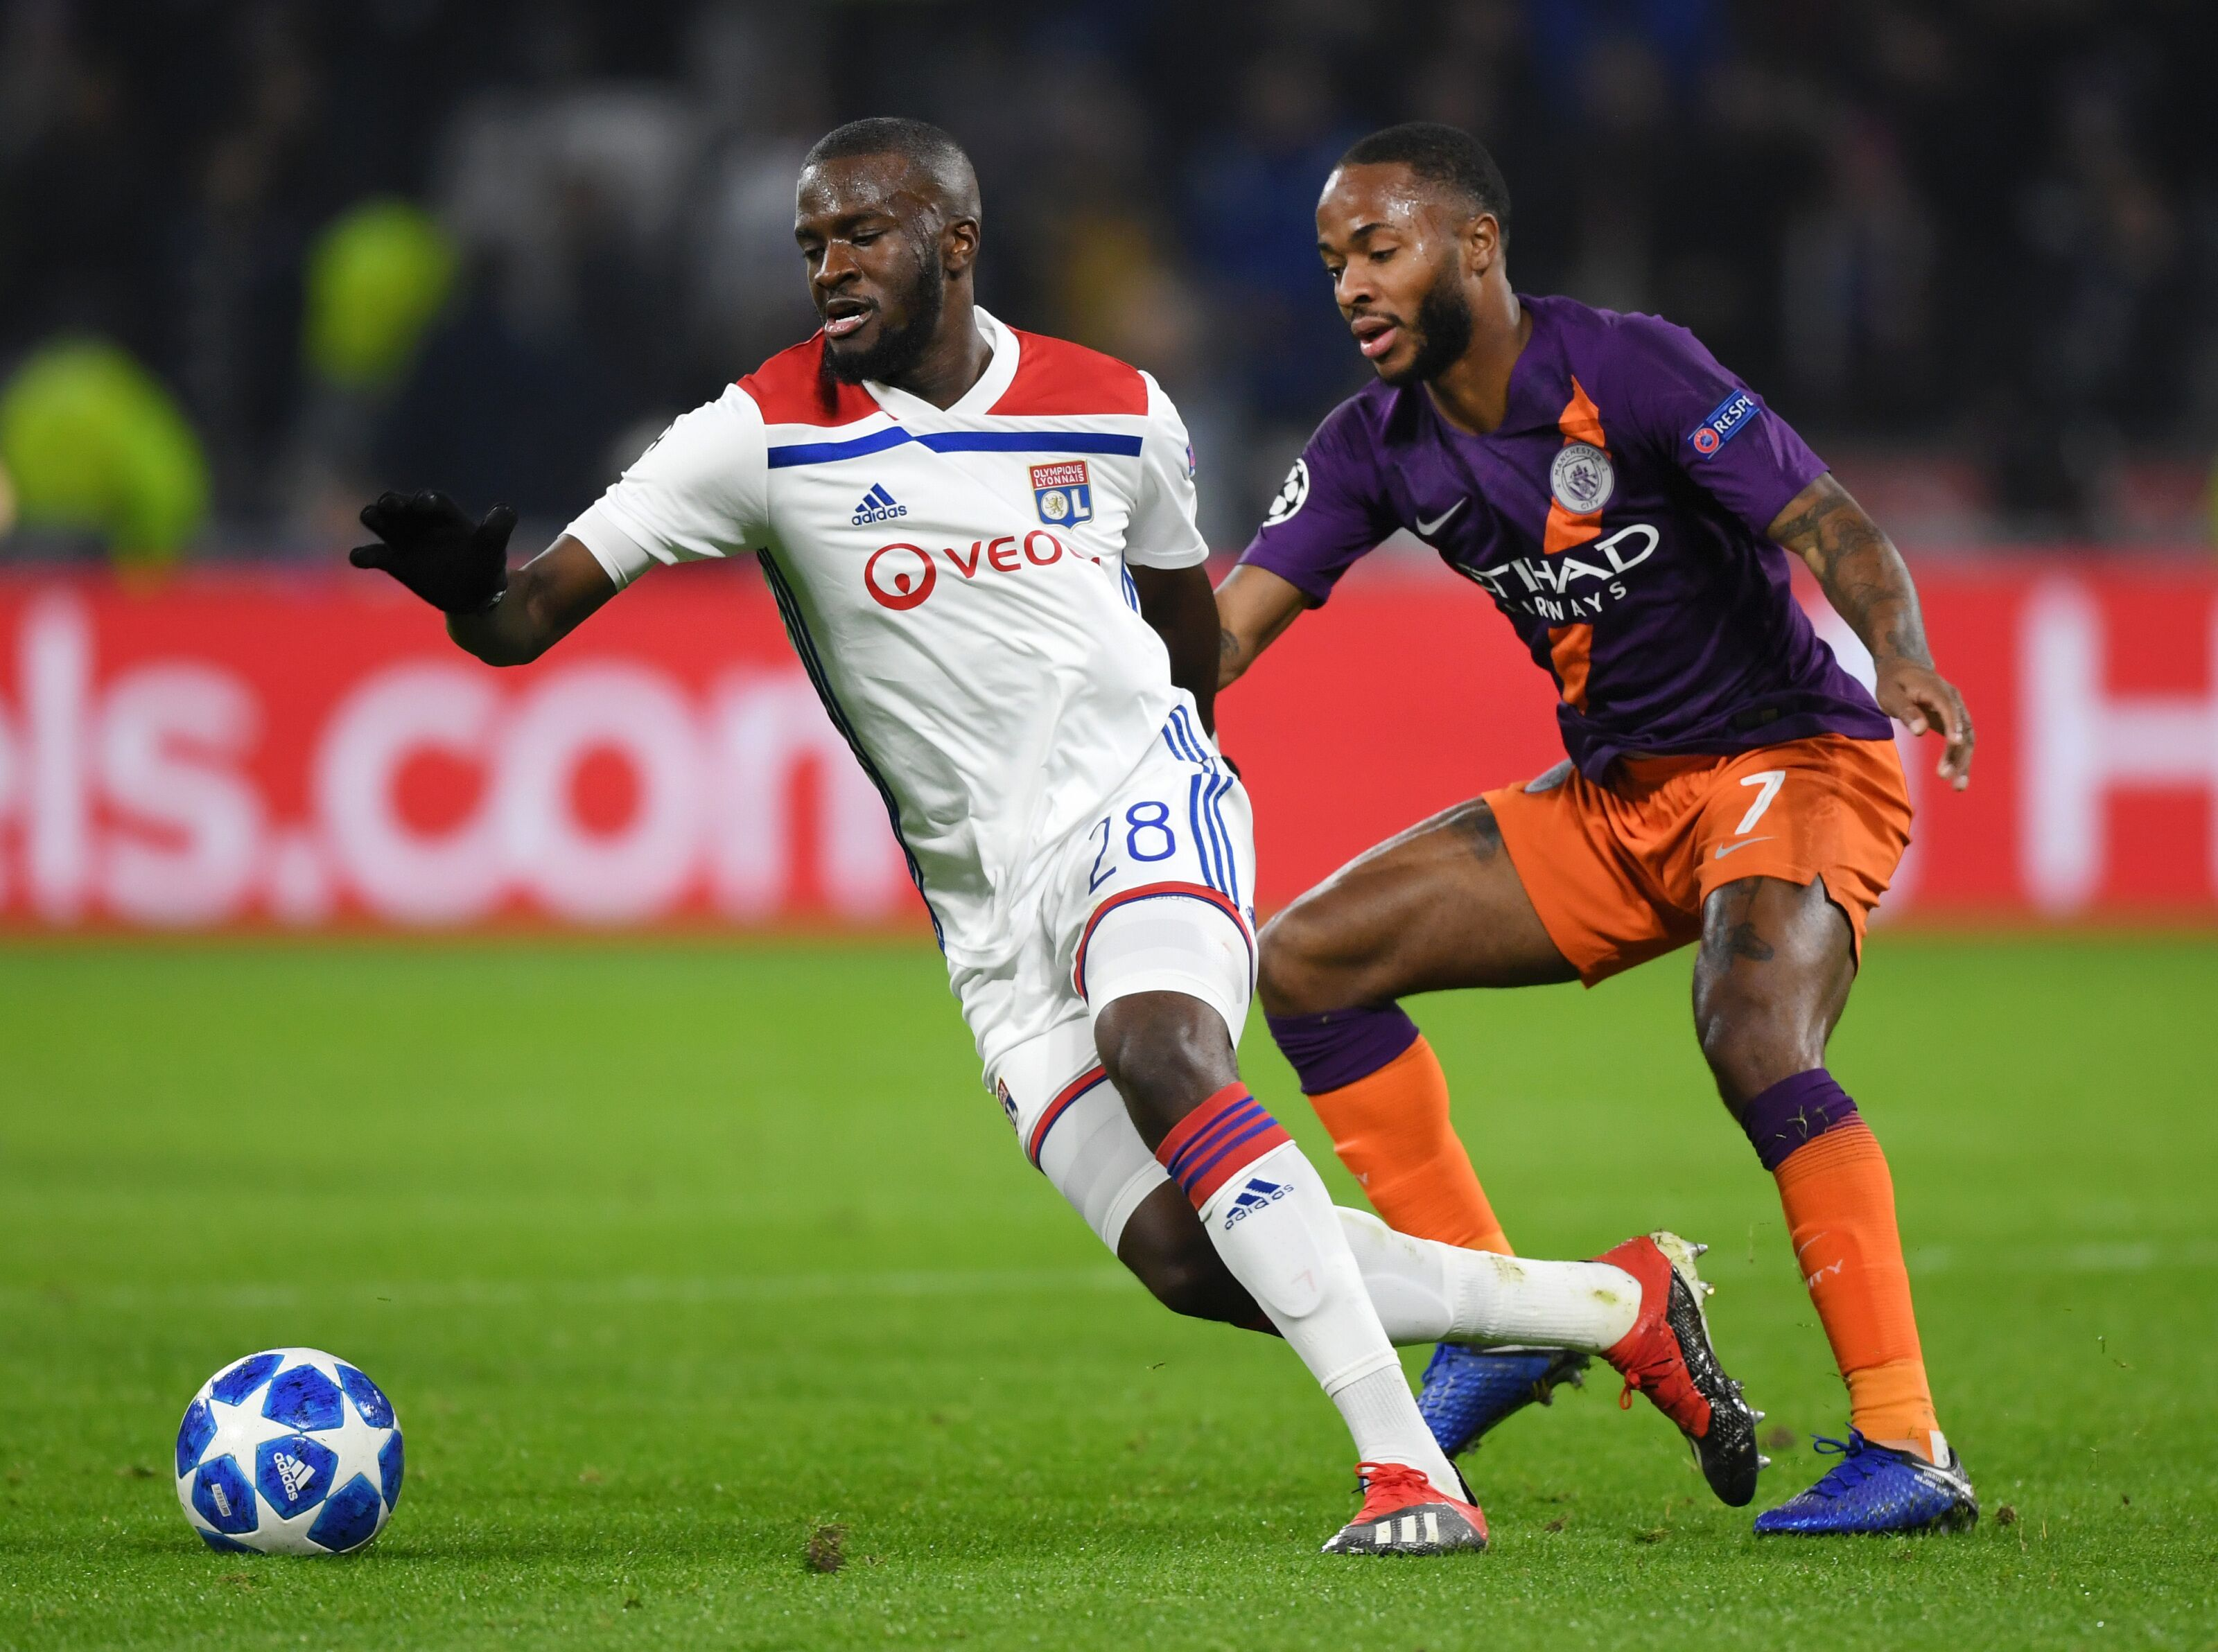 Is prospective Tottenham signing Ndombele worth £200 000 per week?